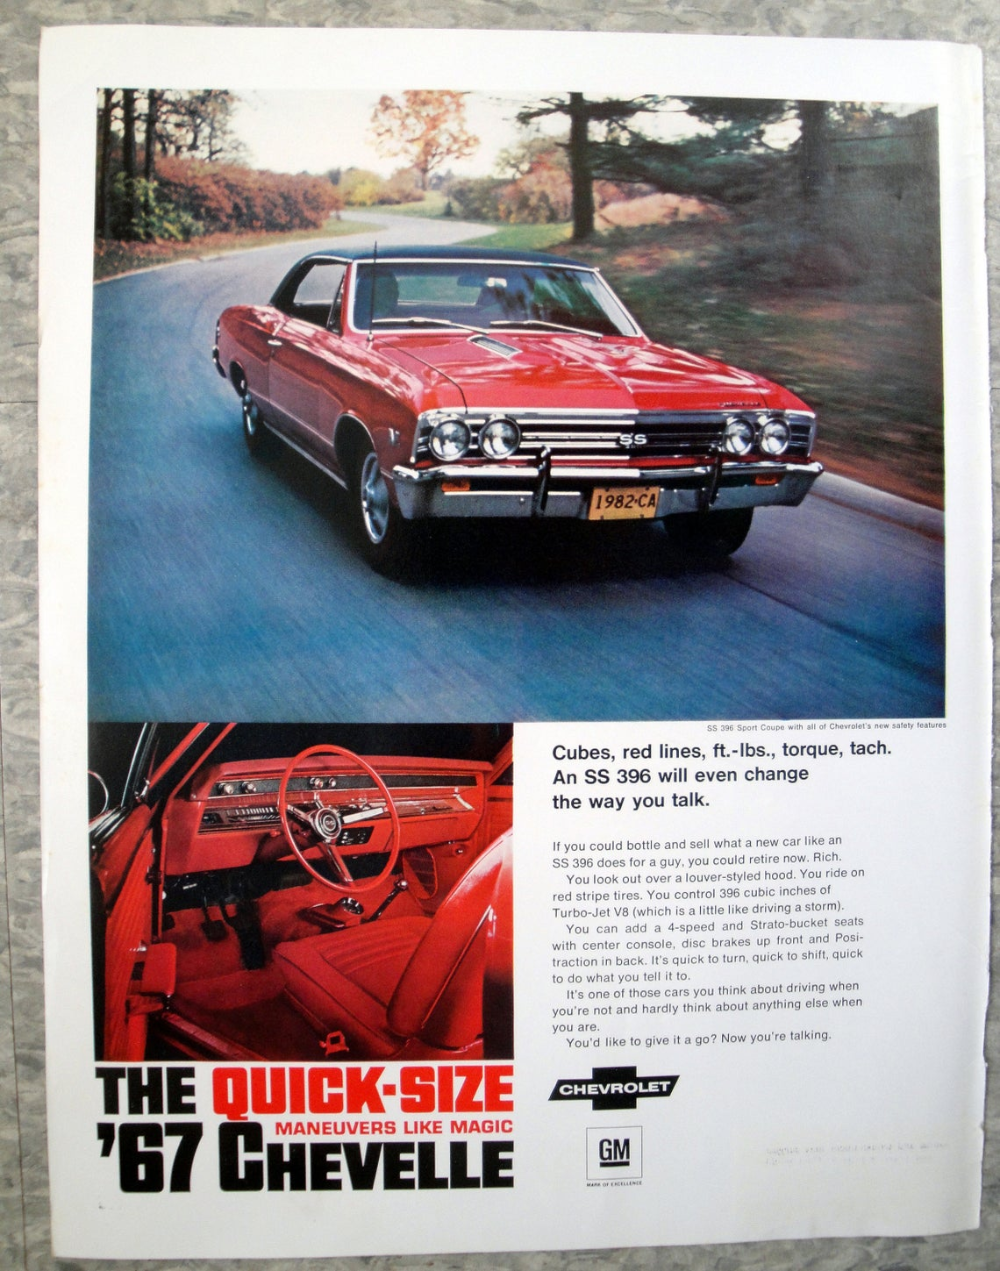 1967 Chevrolet Chevelle Red SS 396 Sport Coupe-Original 13.5 * 10.5 Magazine Ad